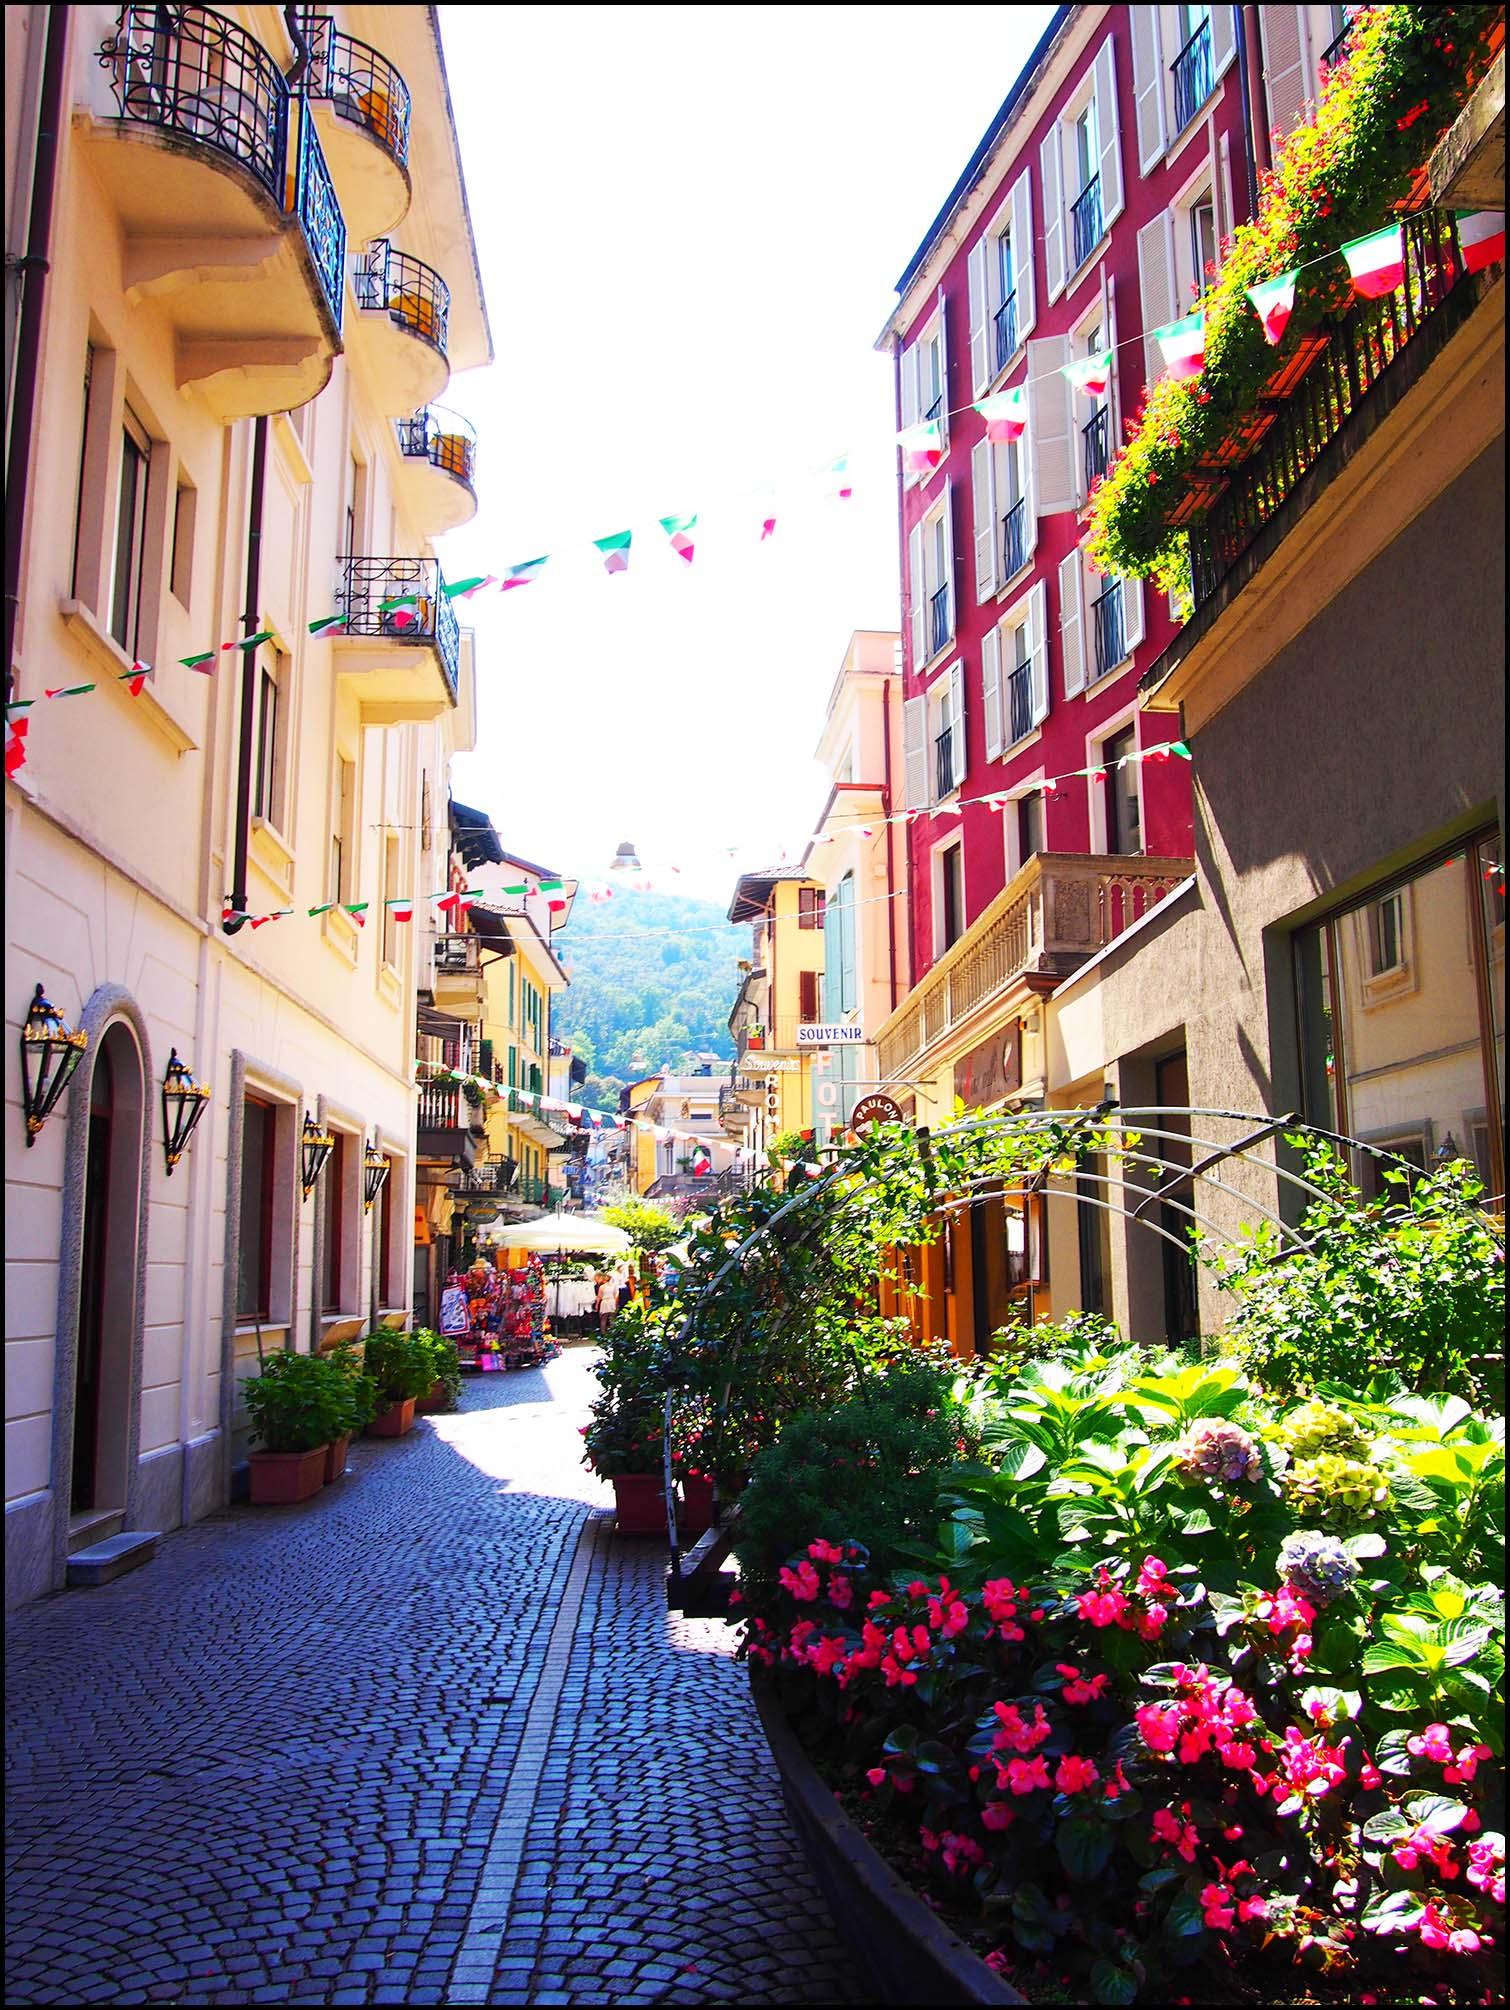 Street scene, Stresa, Italy